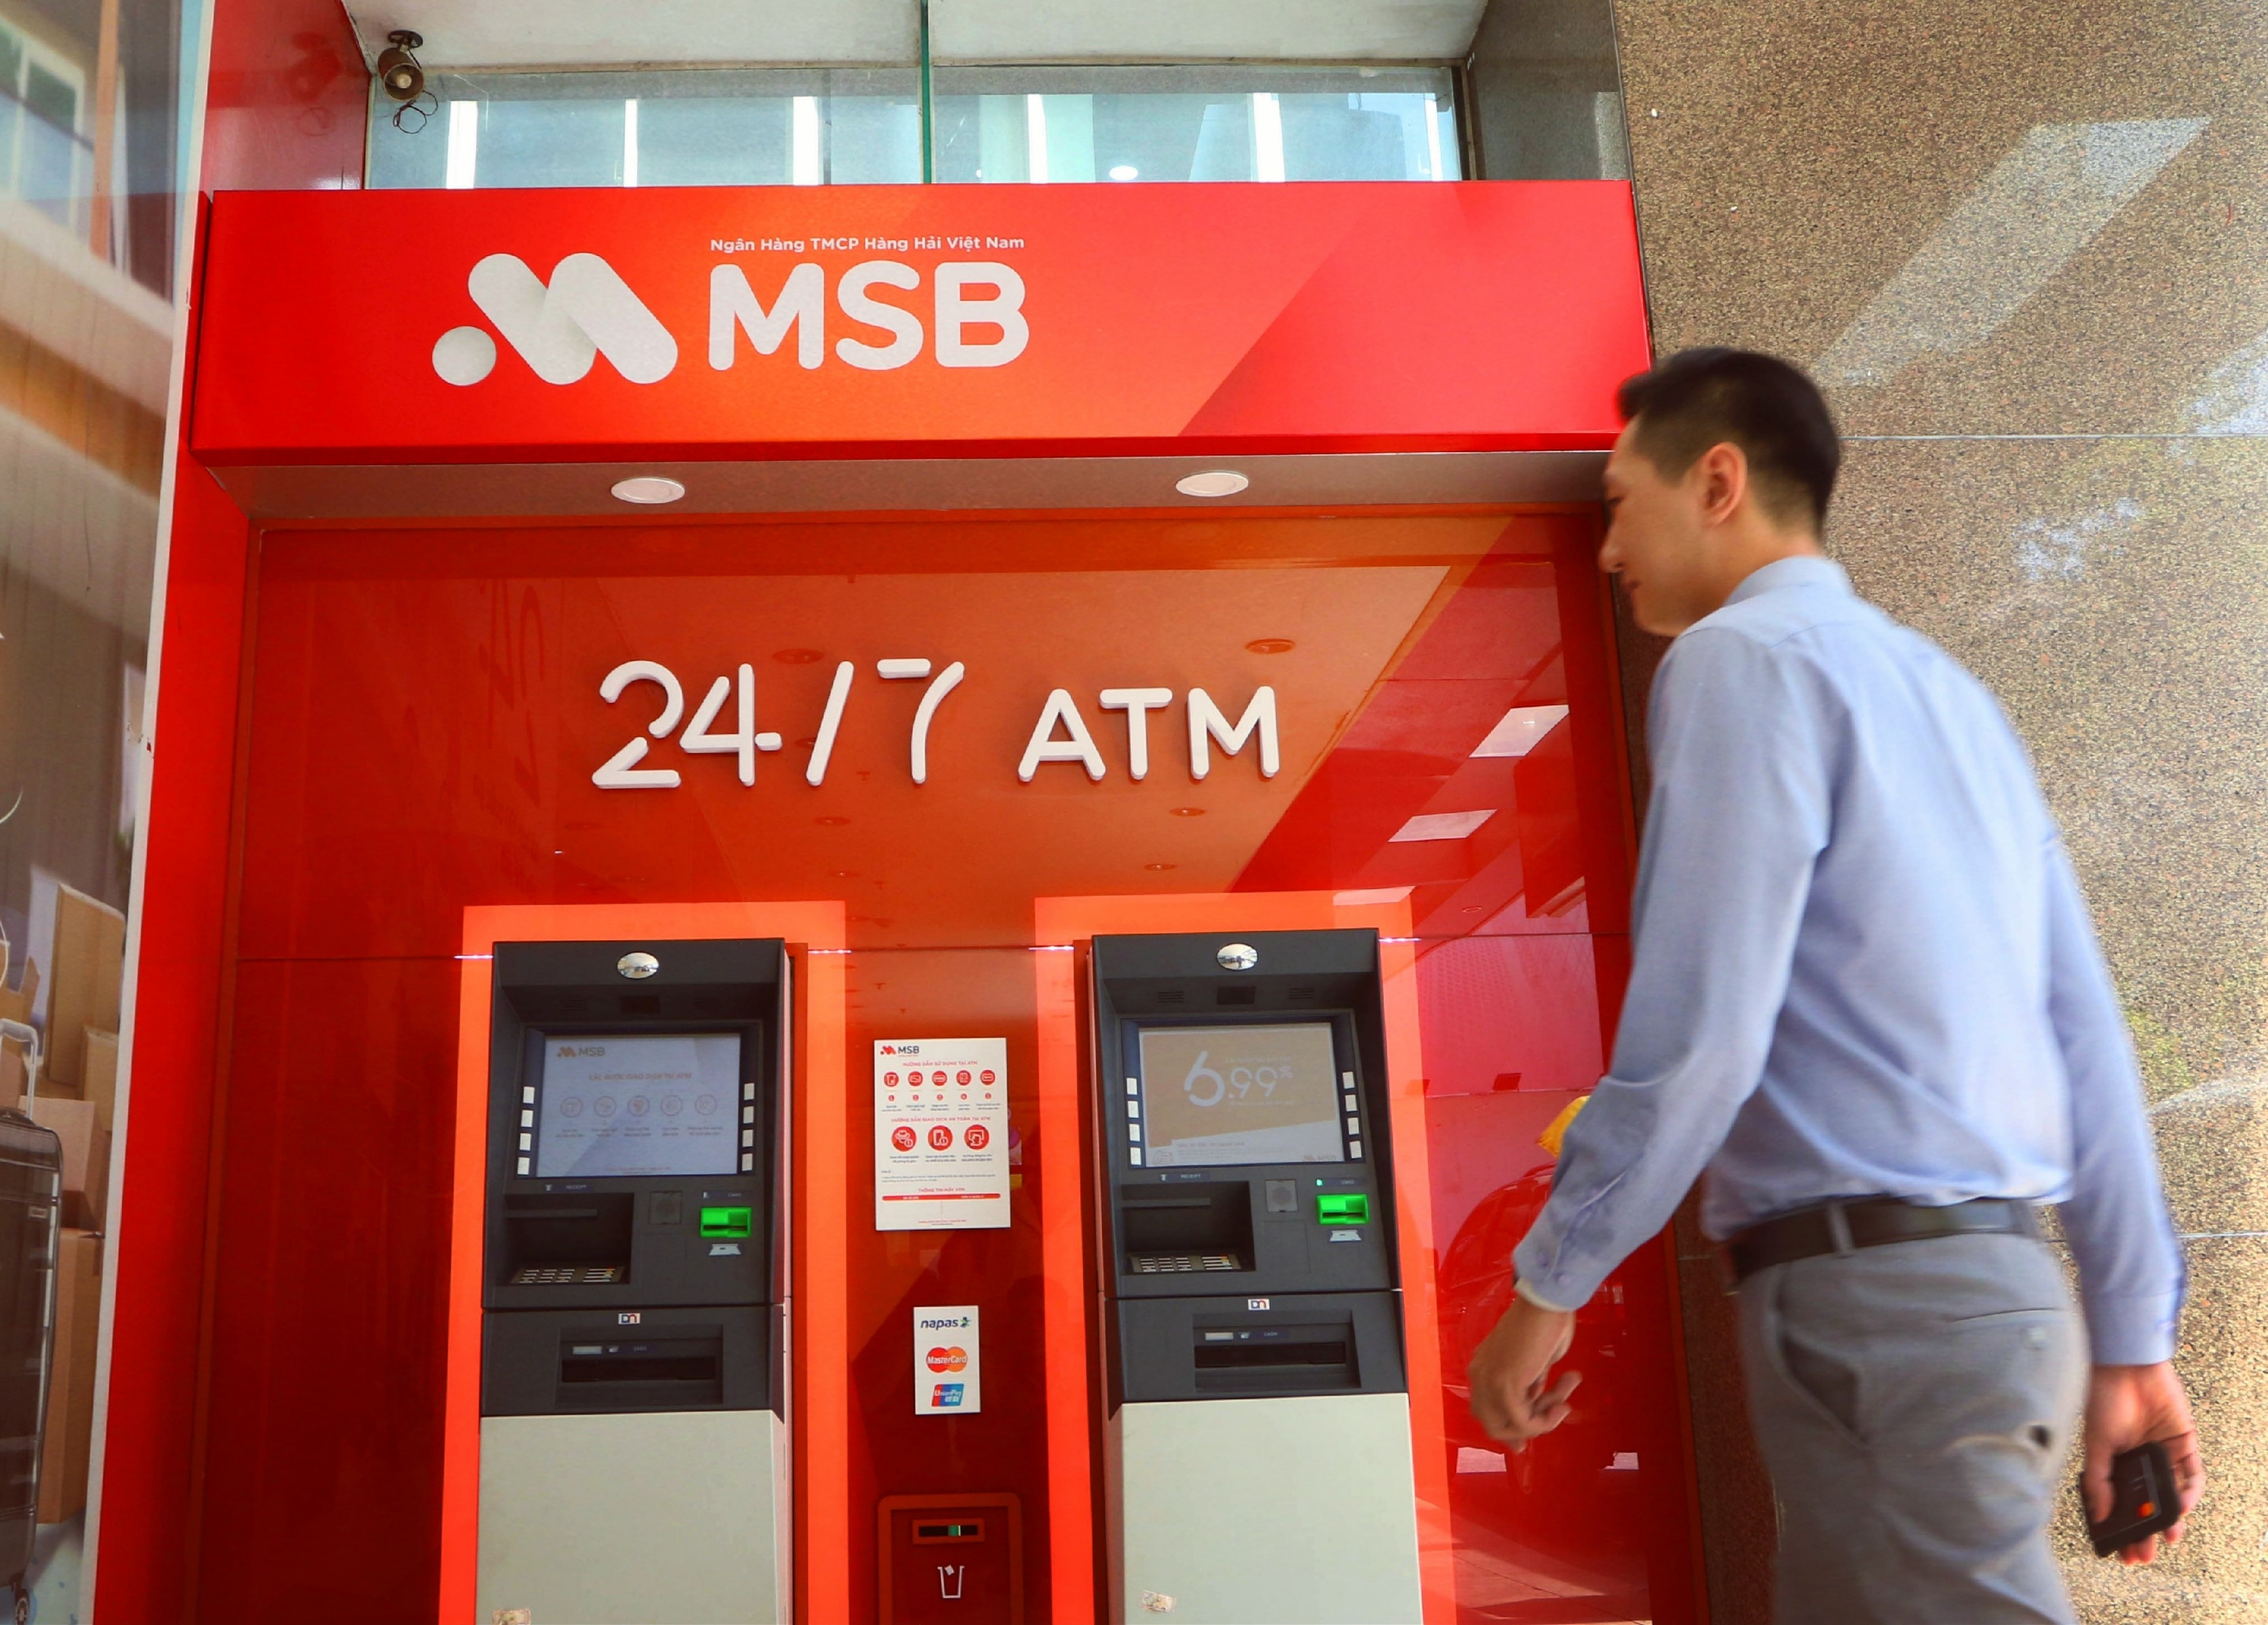 DATC muốn bán gần 310.000 cổ phiếu MSB